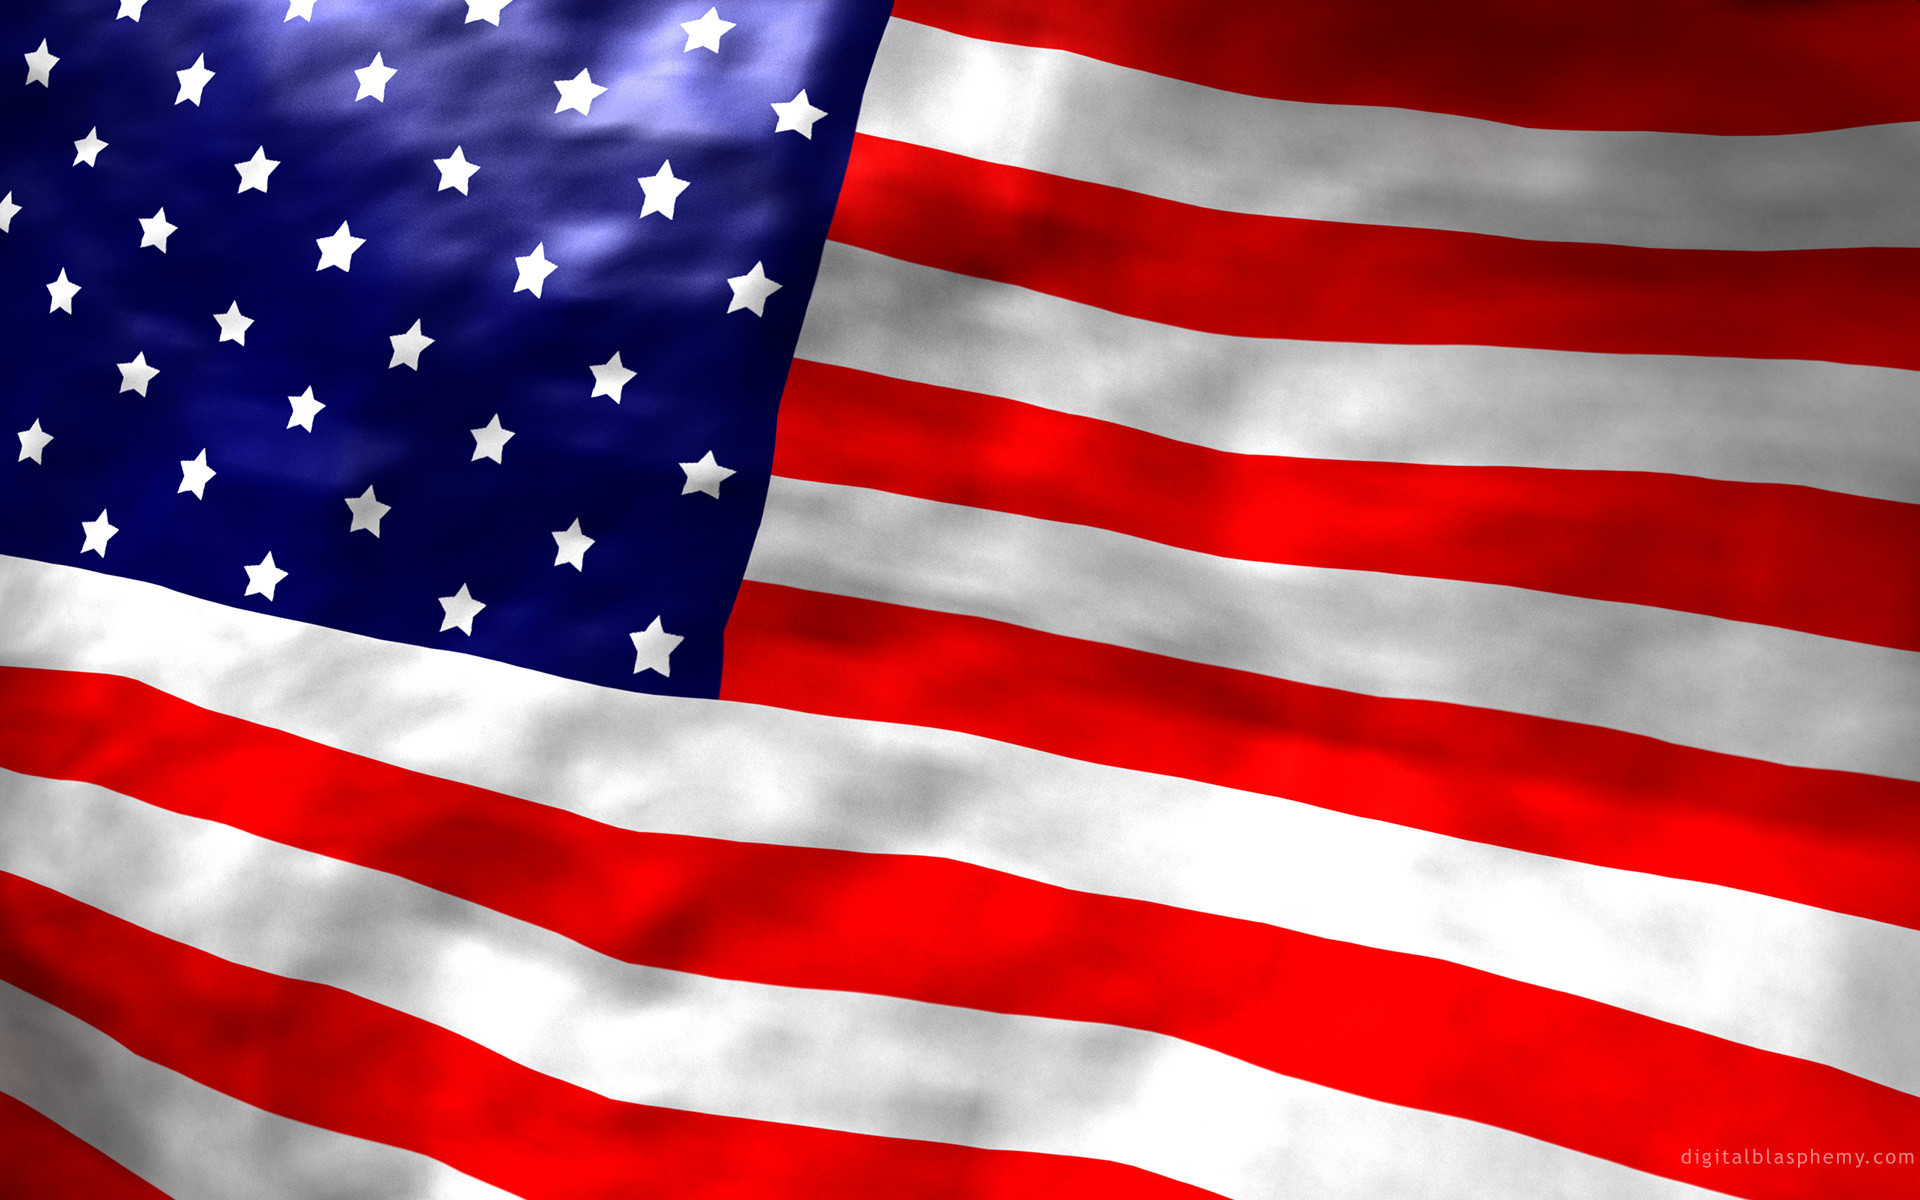 Flags USA Wallpaper Flags, USA, American, Flag